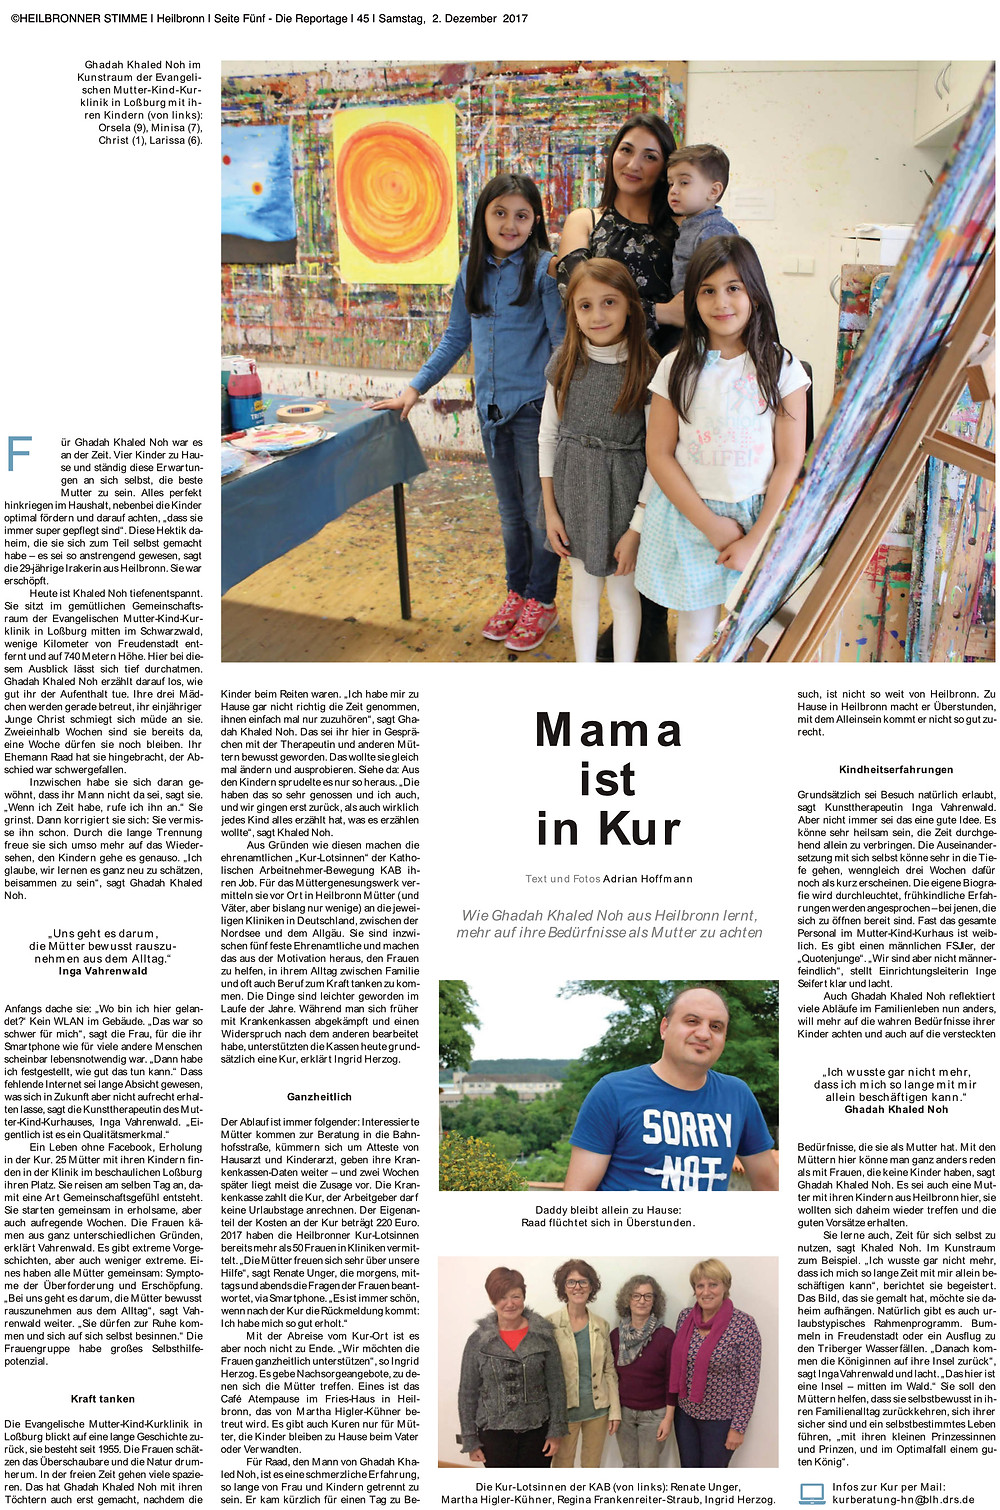 Mama ist in Kur - Müttergenesung Loßburg hilft